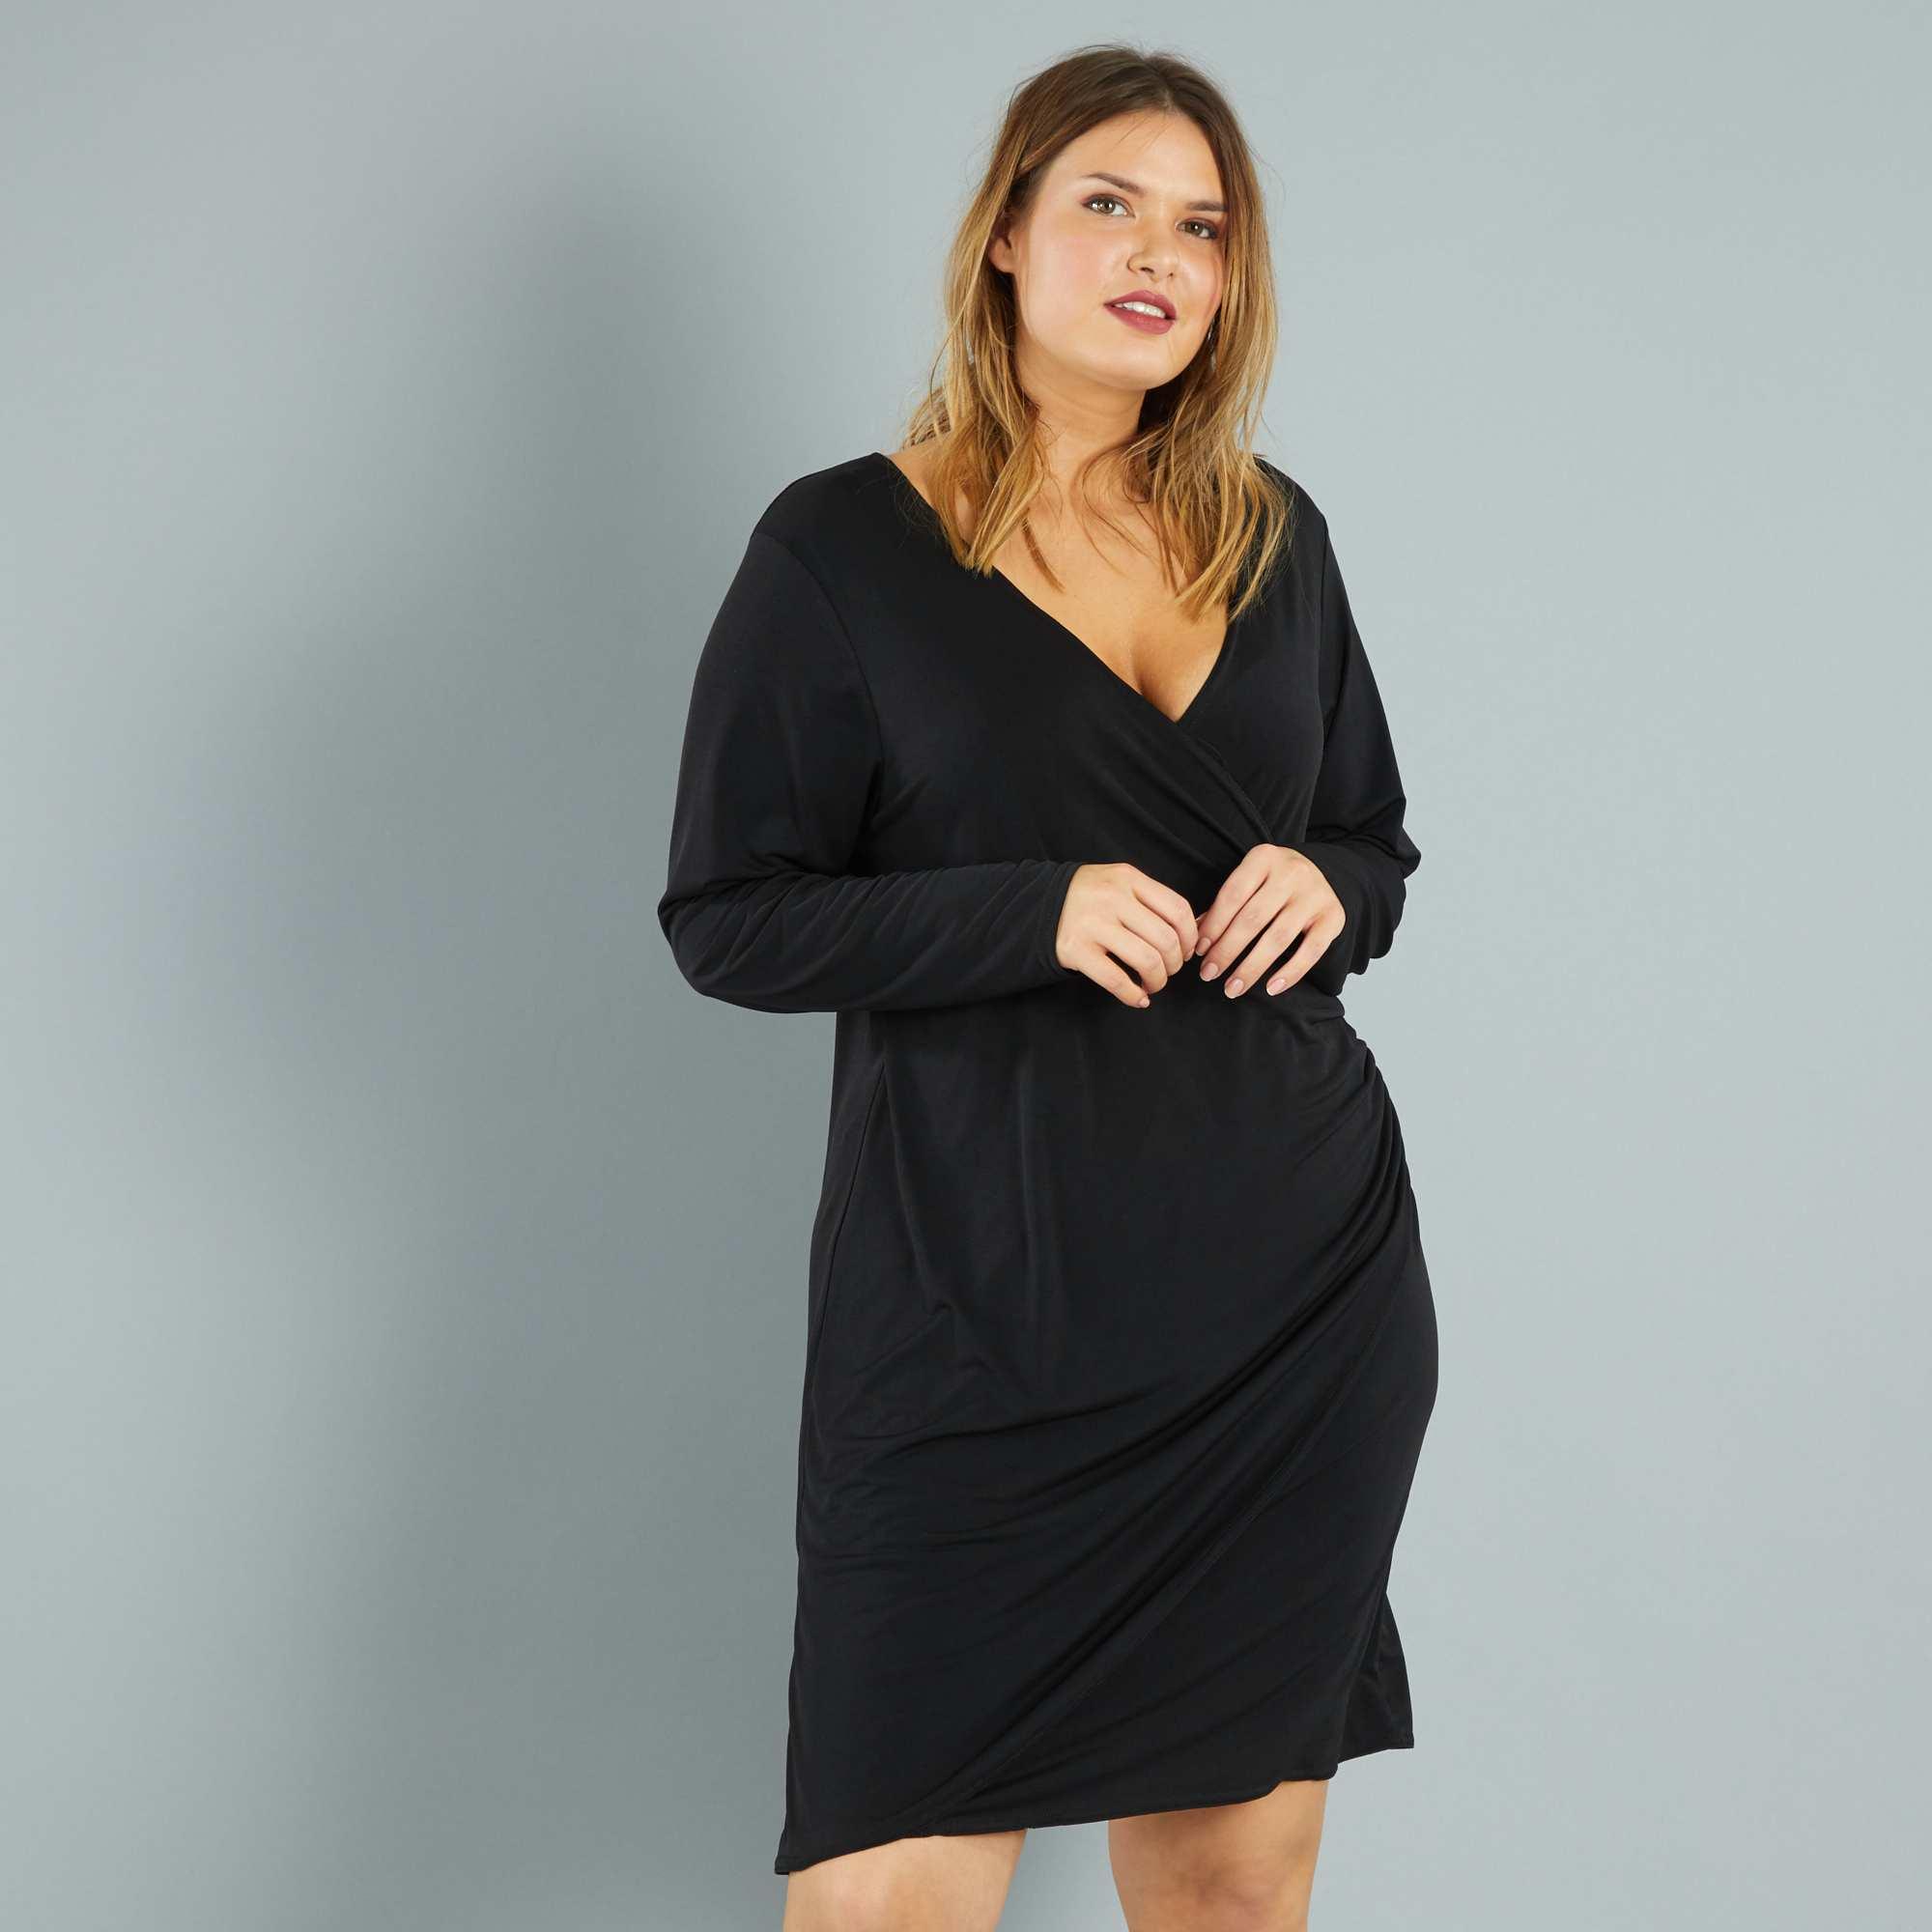 robe courte effet cache coeur grande taille femme noir kiabi 25 00. Black Bedroom Furniture Sets. Home Design Ideas